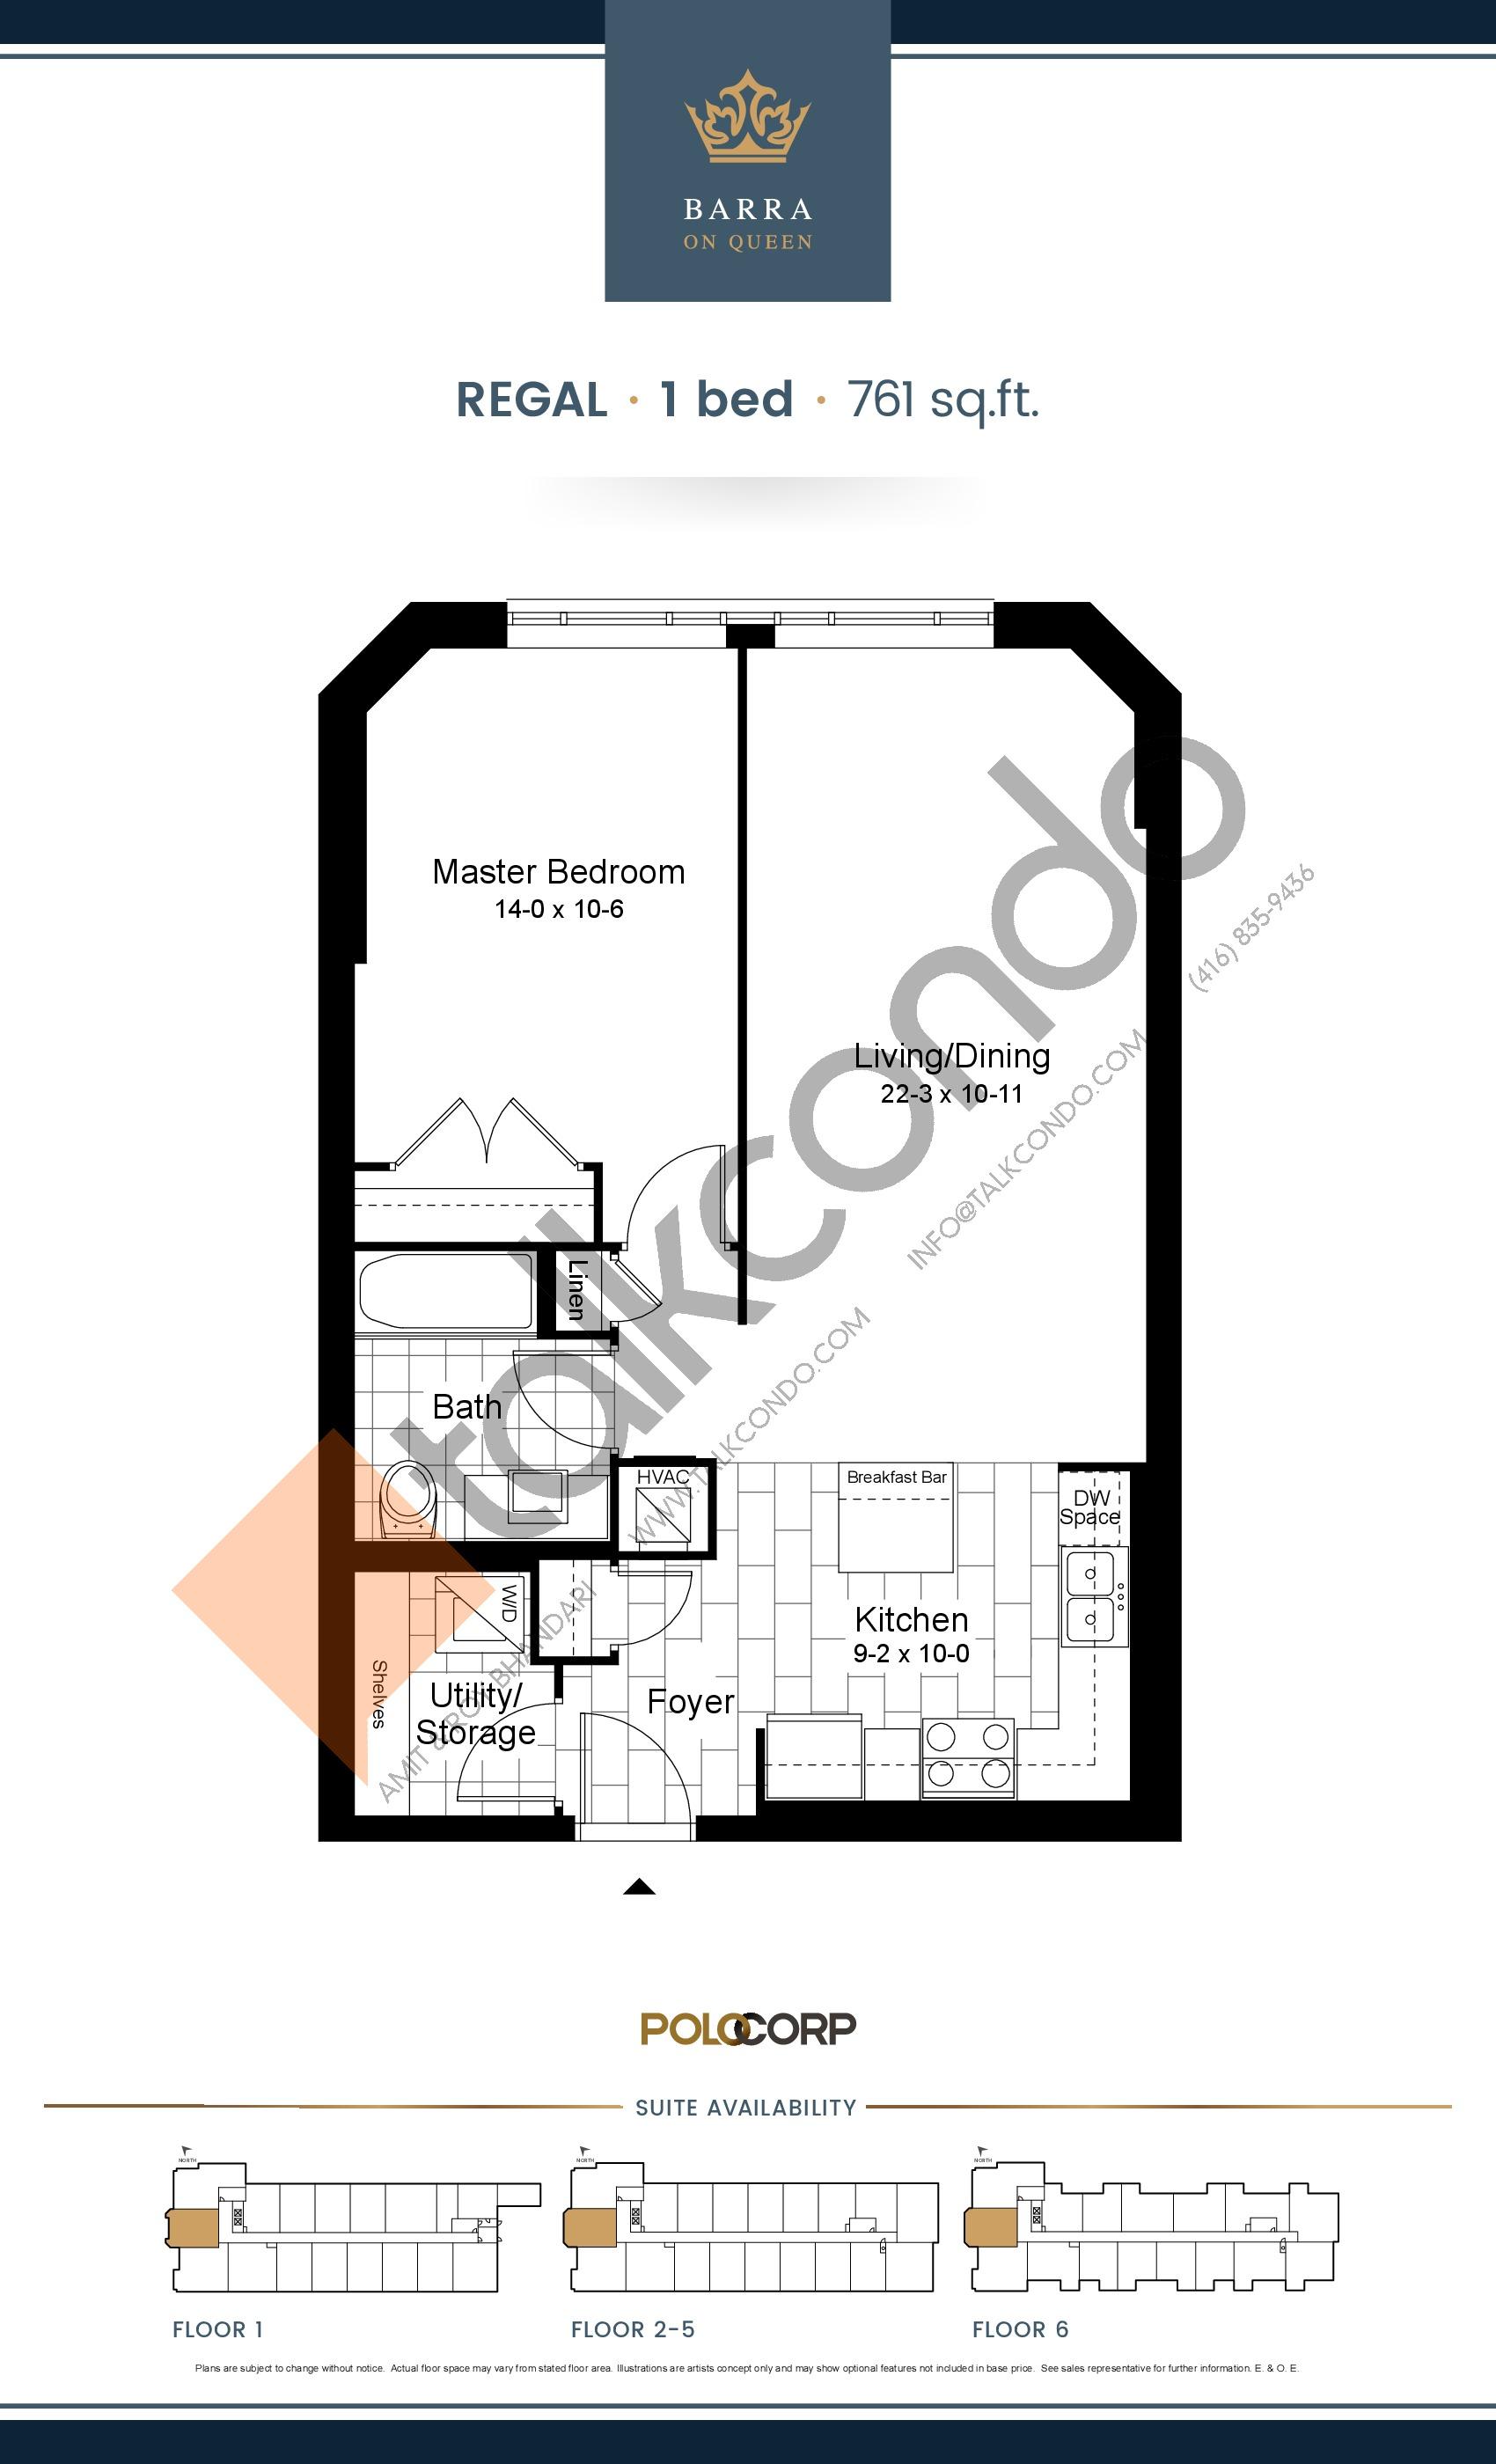 Regal Floor Plan at Barra on Queen Condos - 761 sq.ft